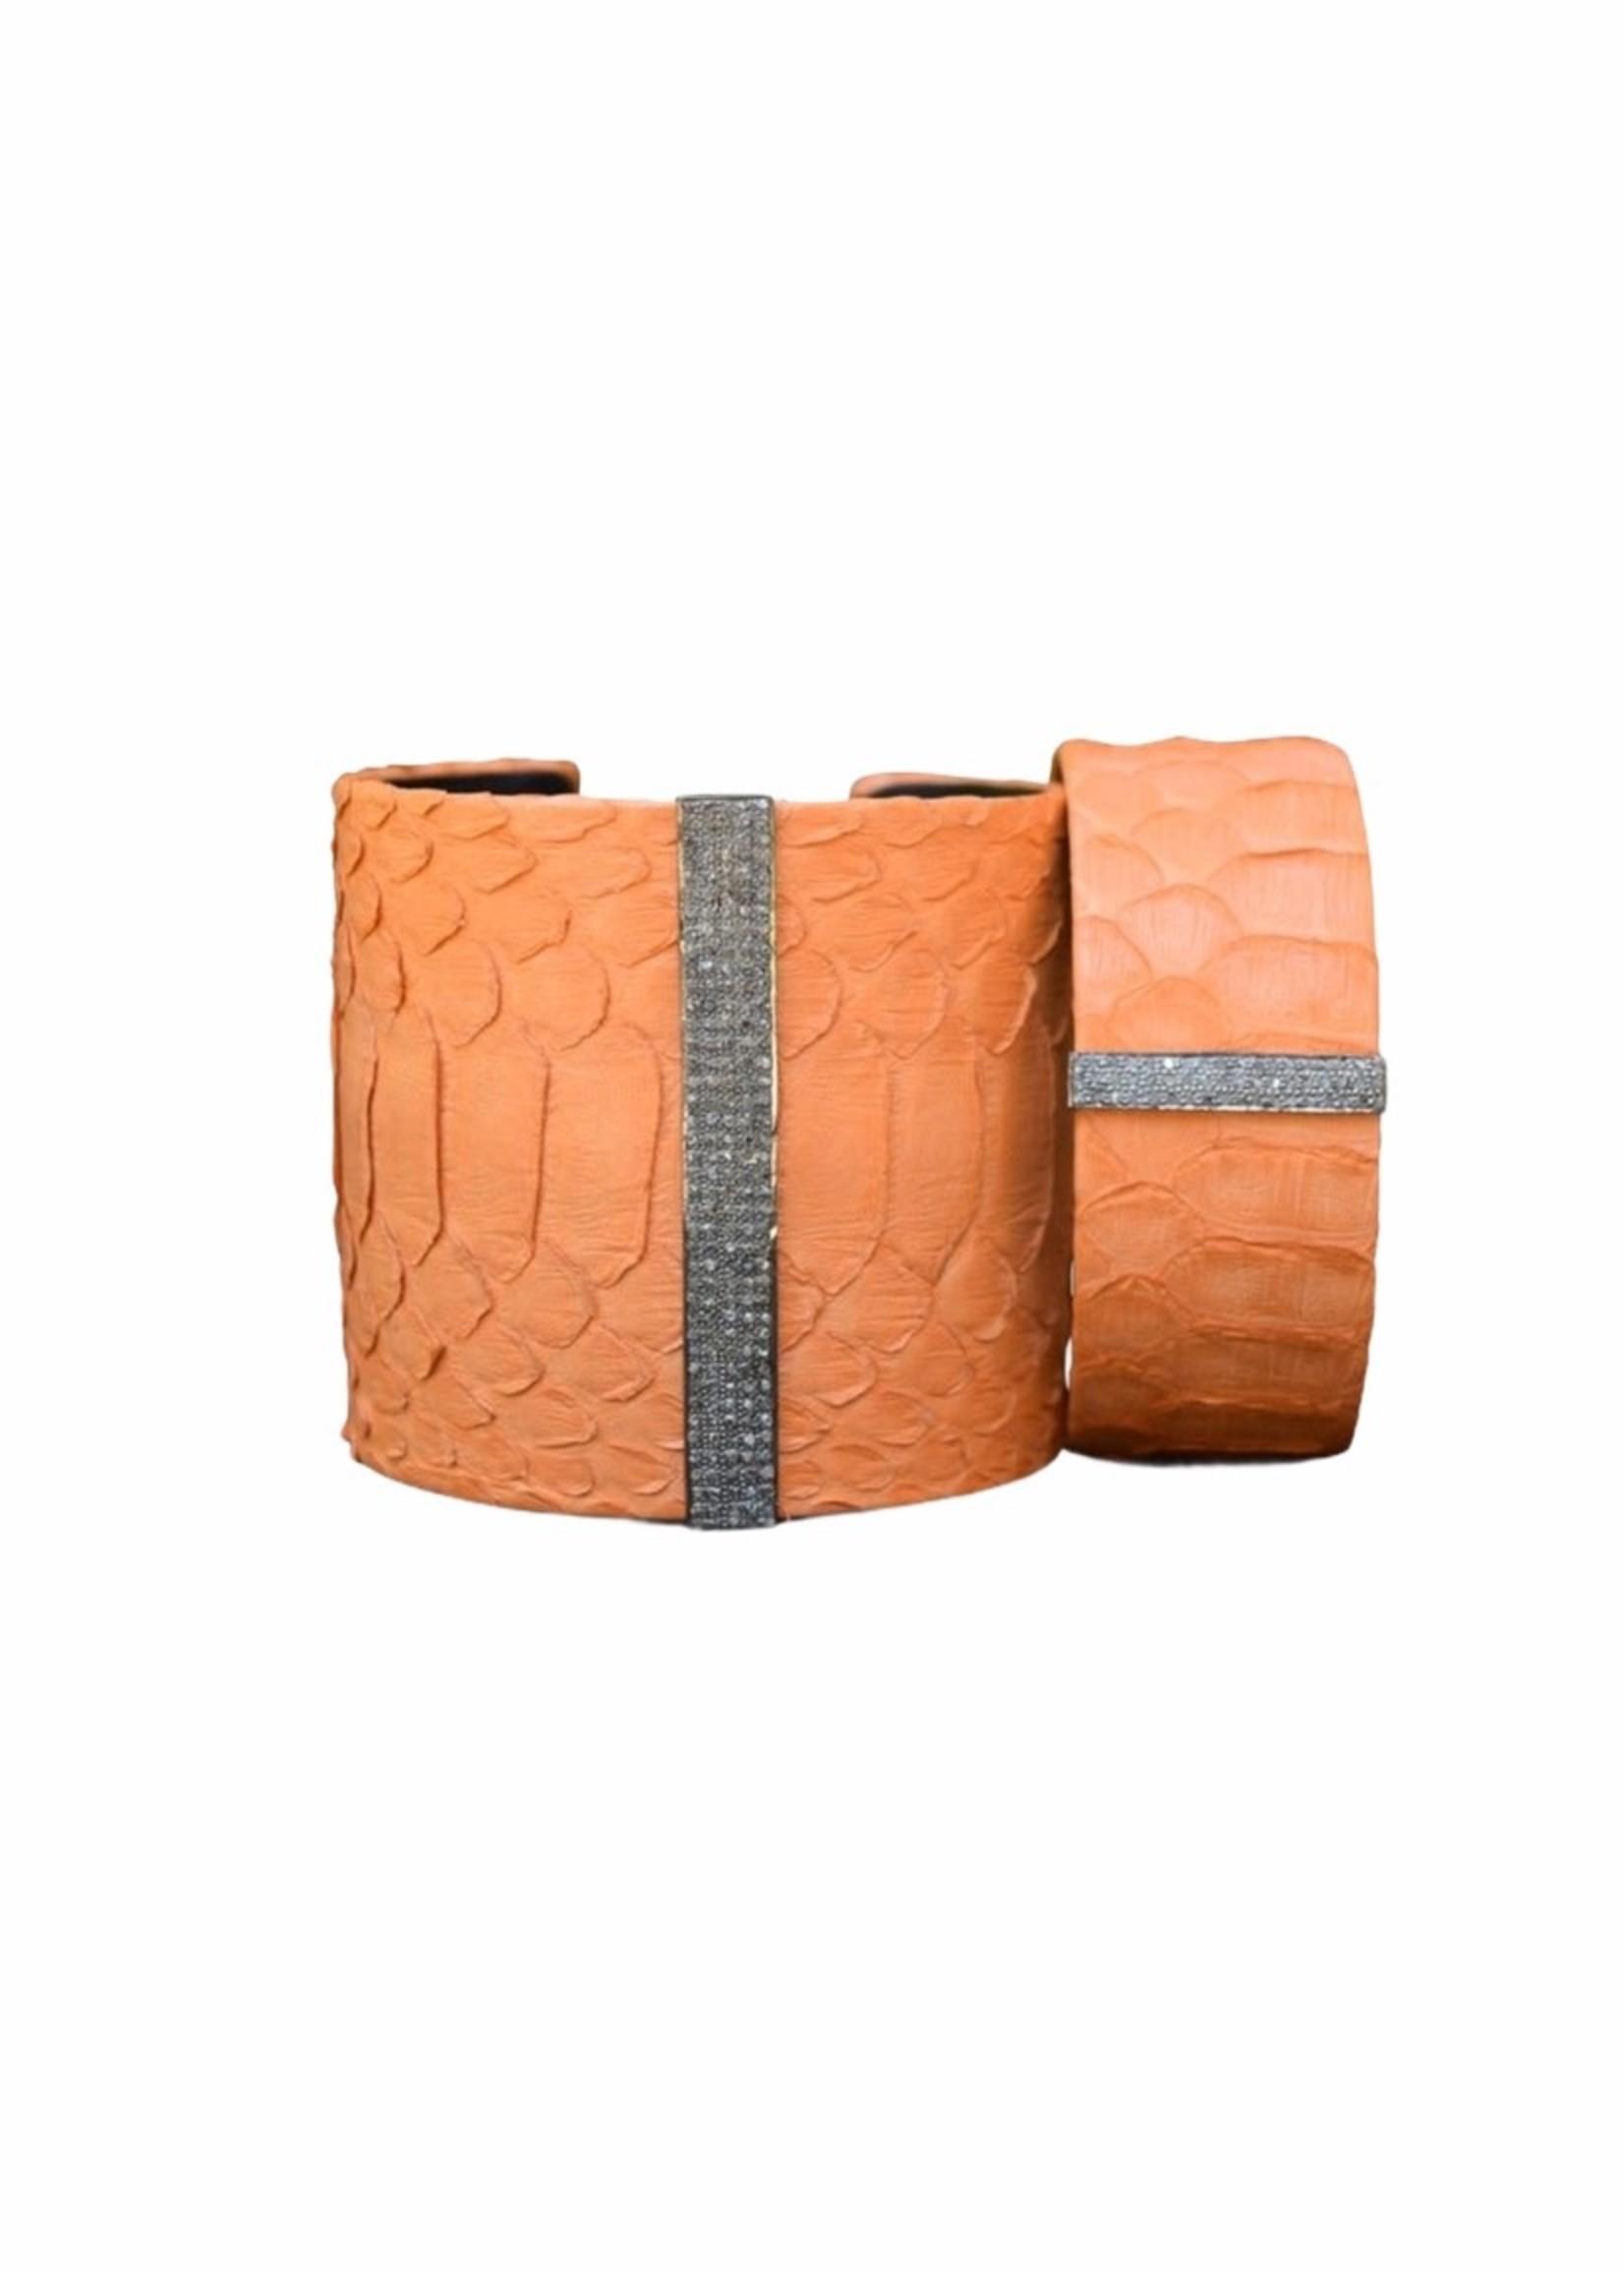 S. Carter Designs Small Orange Python Cuff